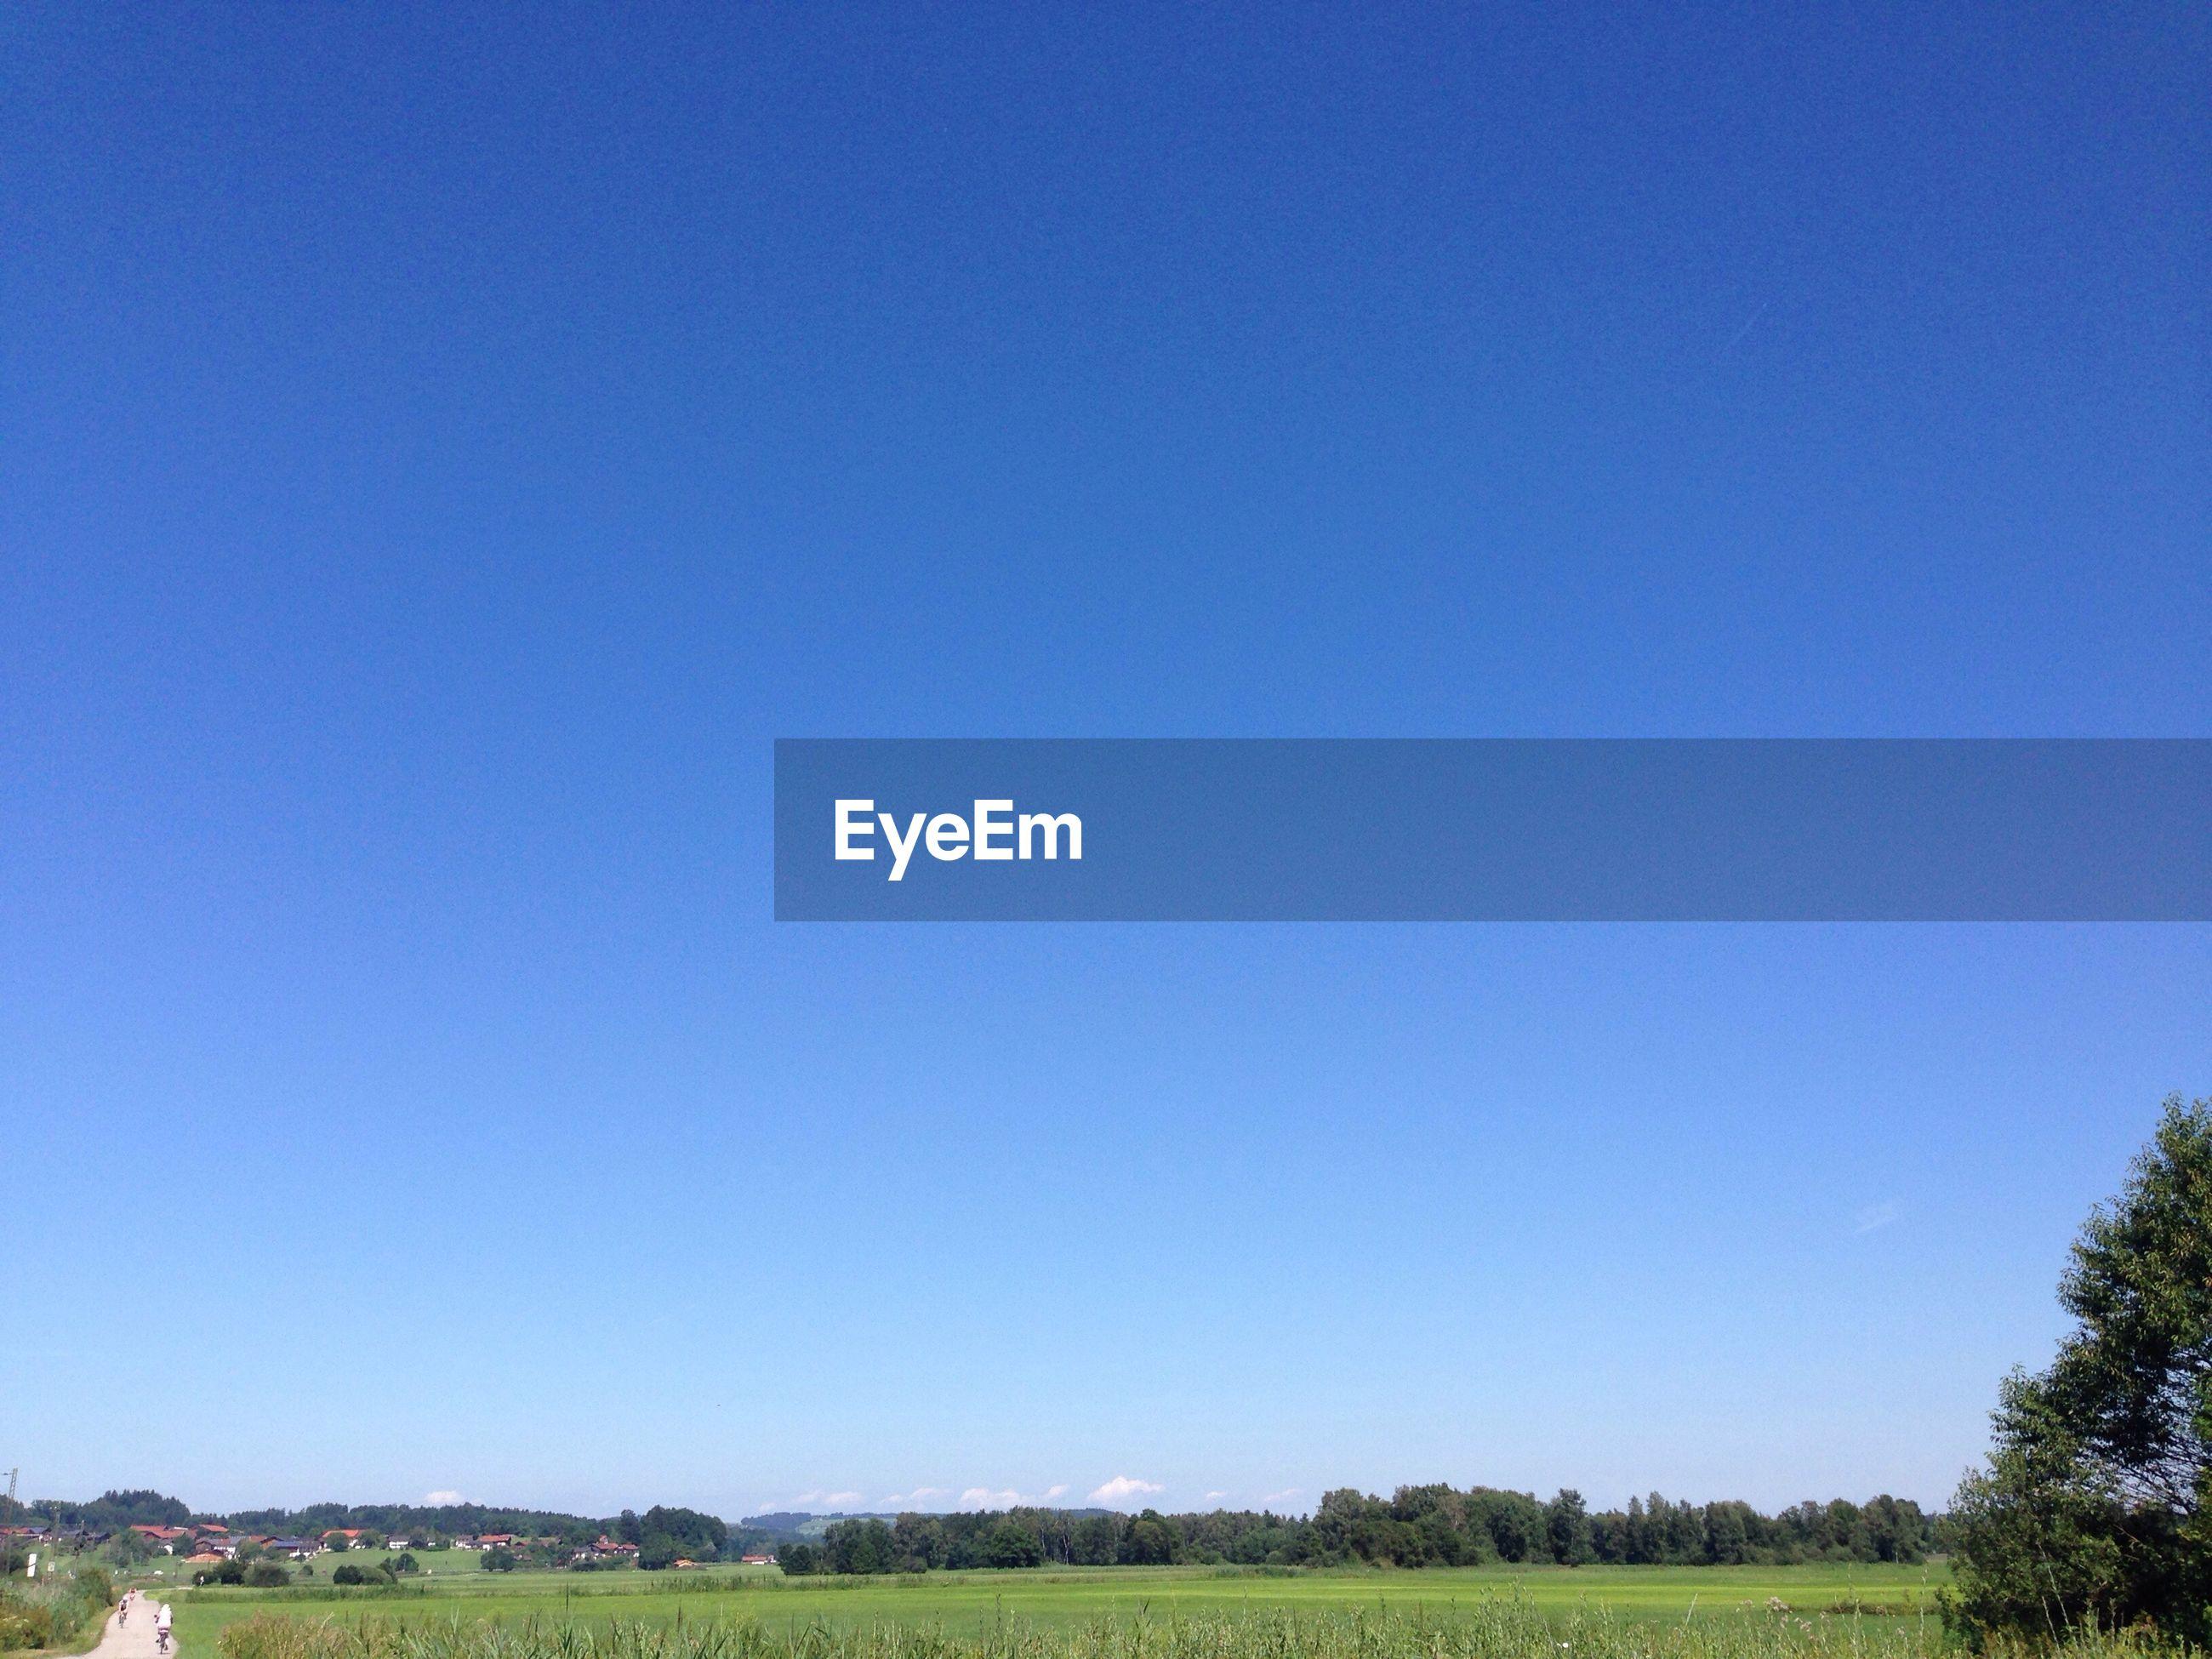 LANDSCAPE AGAINST CLEAR BLUE SKY